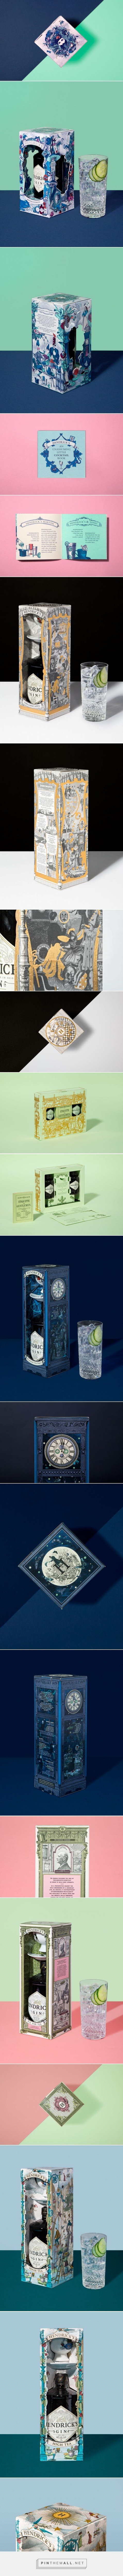 Hendrick's Gin Gift Box design by Here Design - https://www.packagingoftheworld.com/2018/02/hendricks-gin-gift-box.html